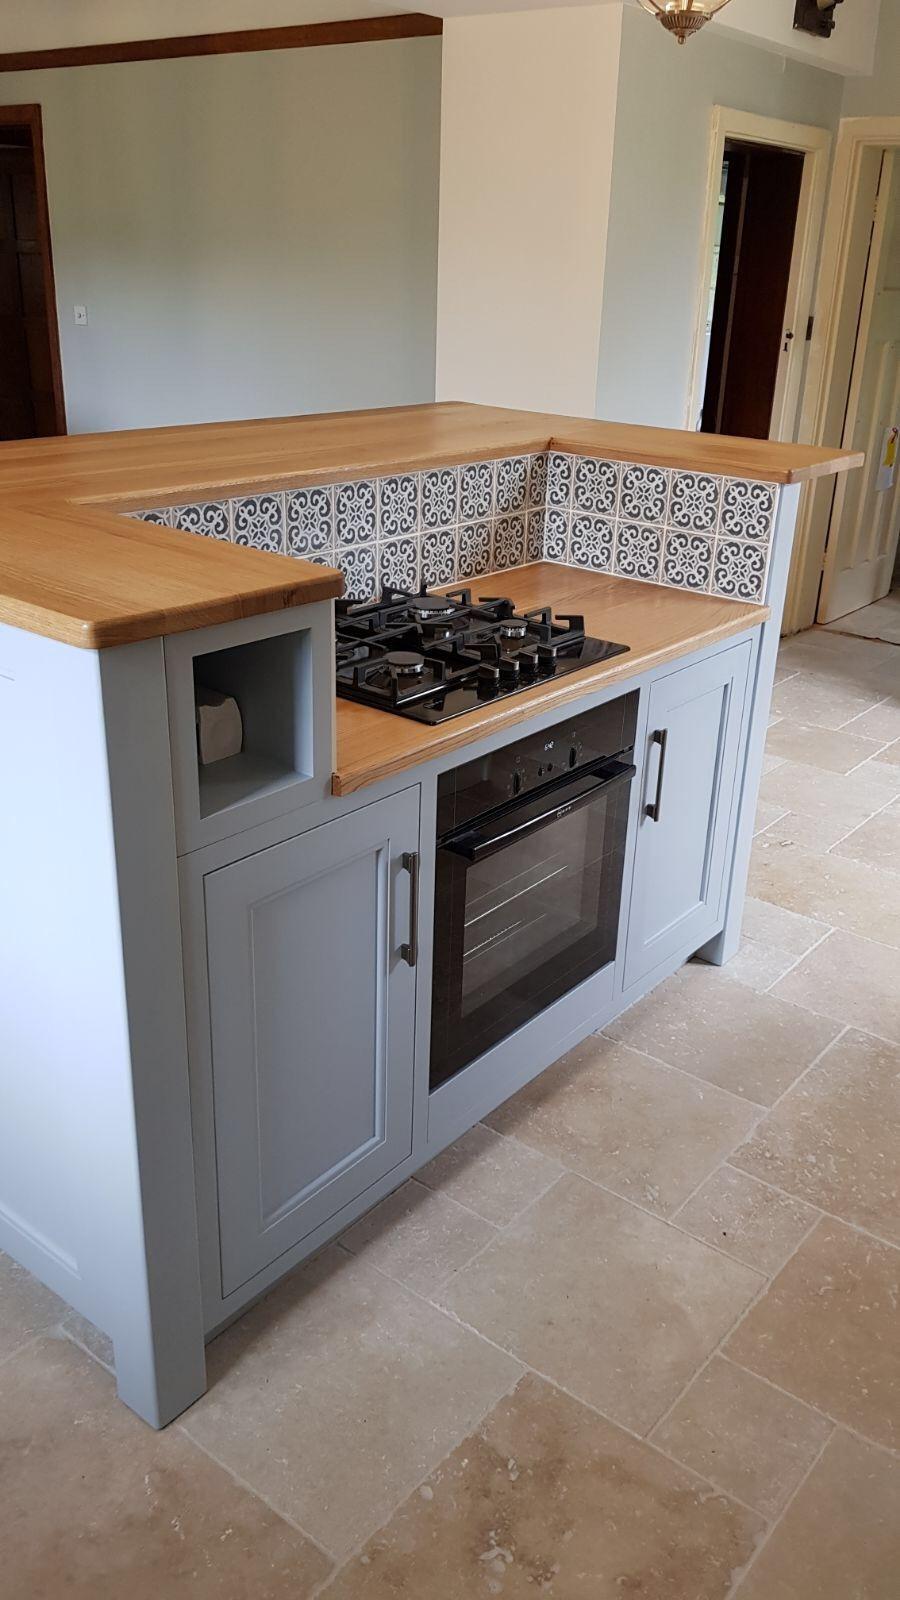 The Mill Kitchen By Eridge Green Bespoke Kitchens & Living